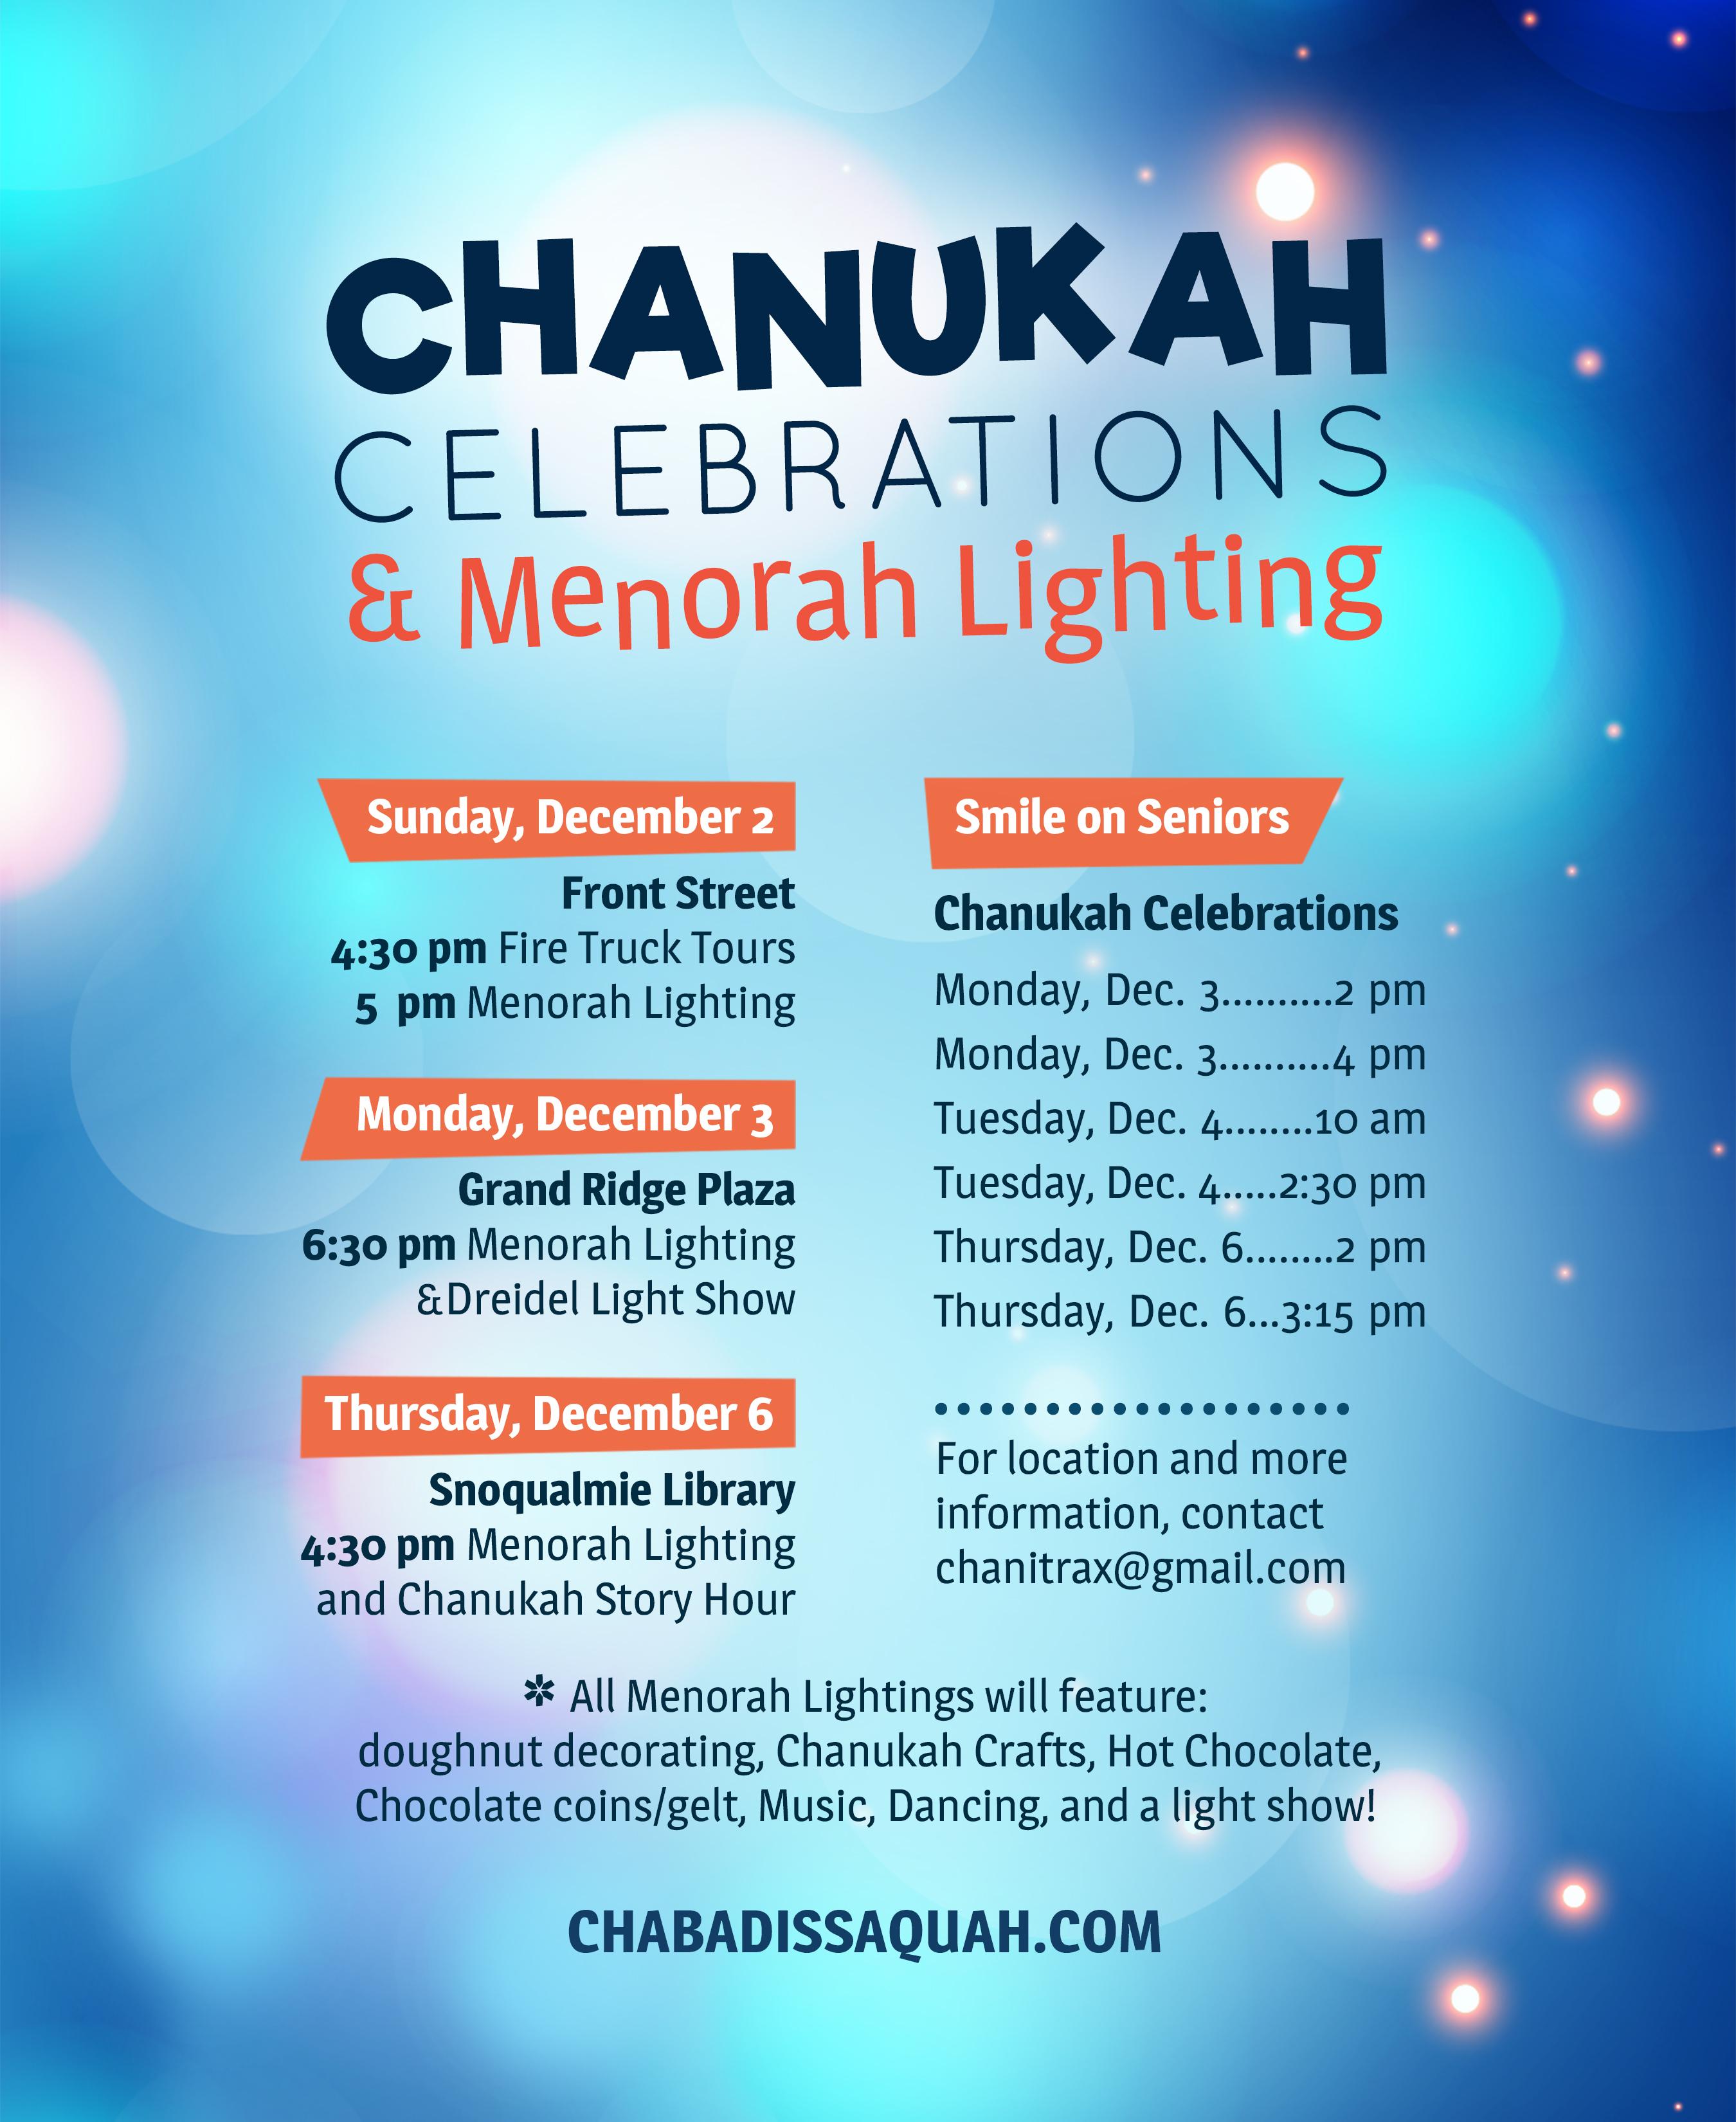 Chanukah Celebrations FULL PAGE.jpg